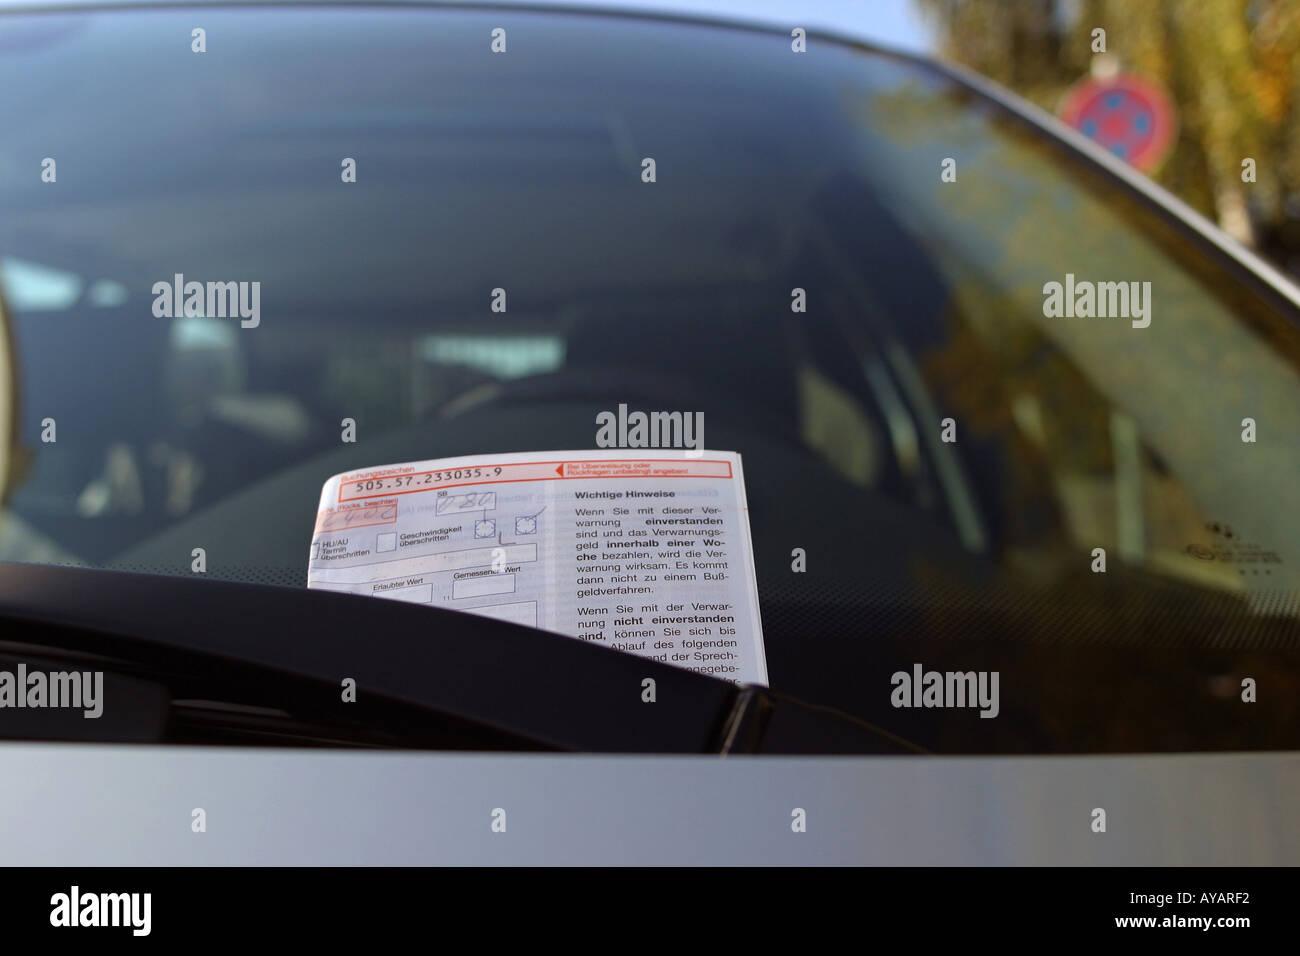 Strafzettel an Windschutzscheibe Stock Photo